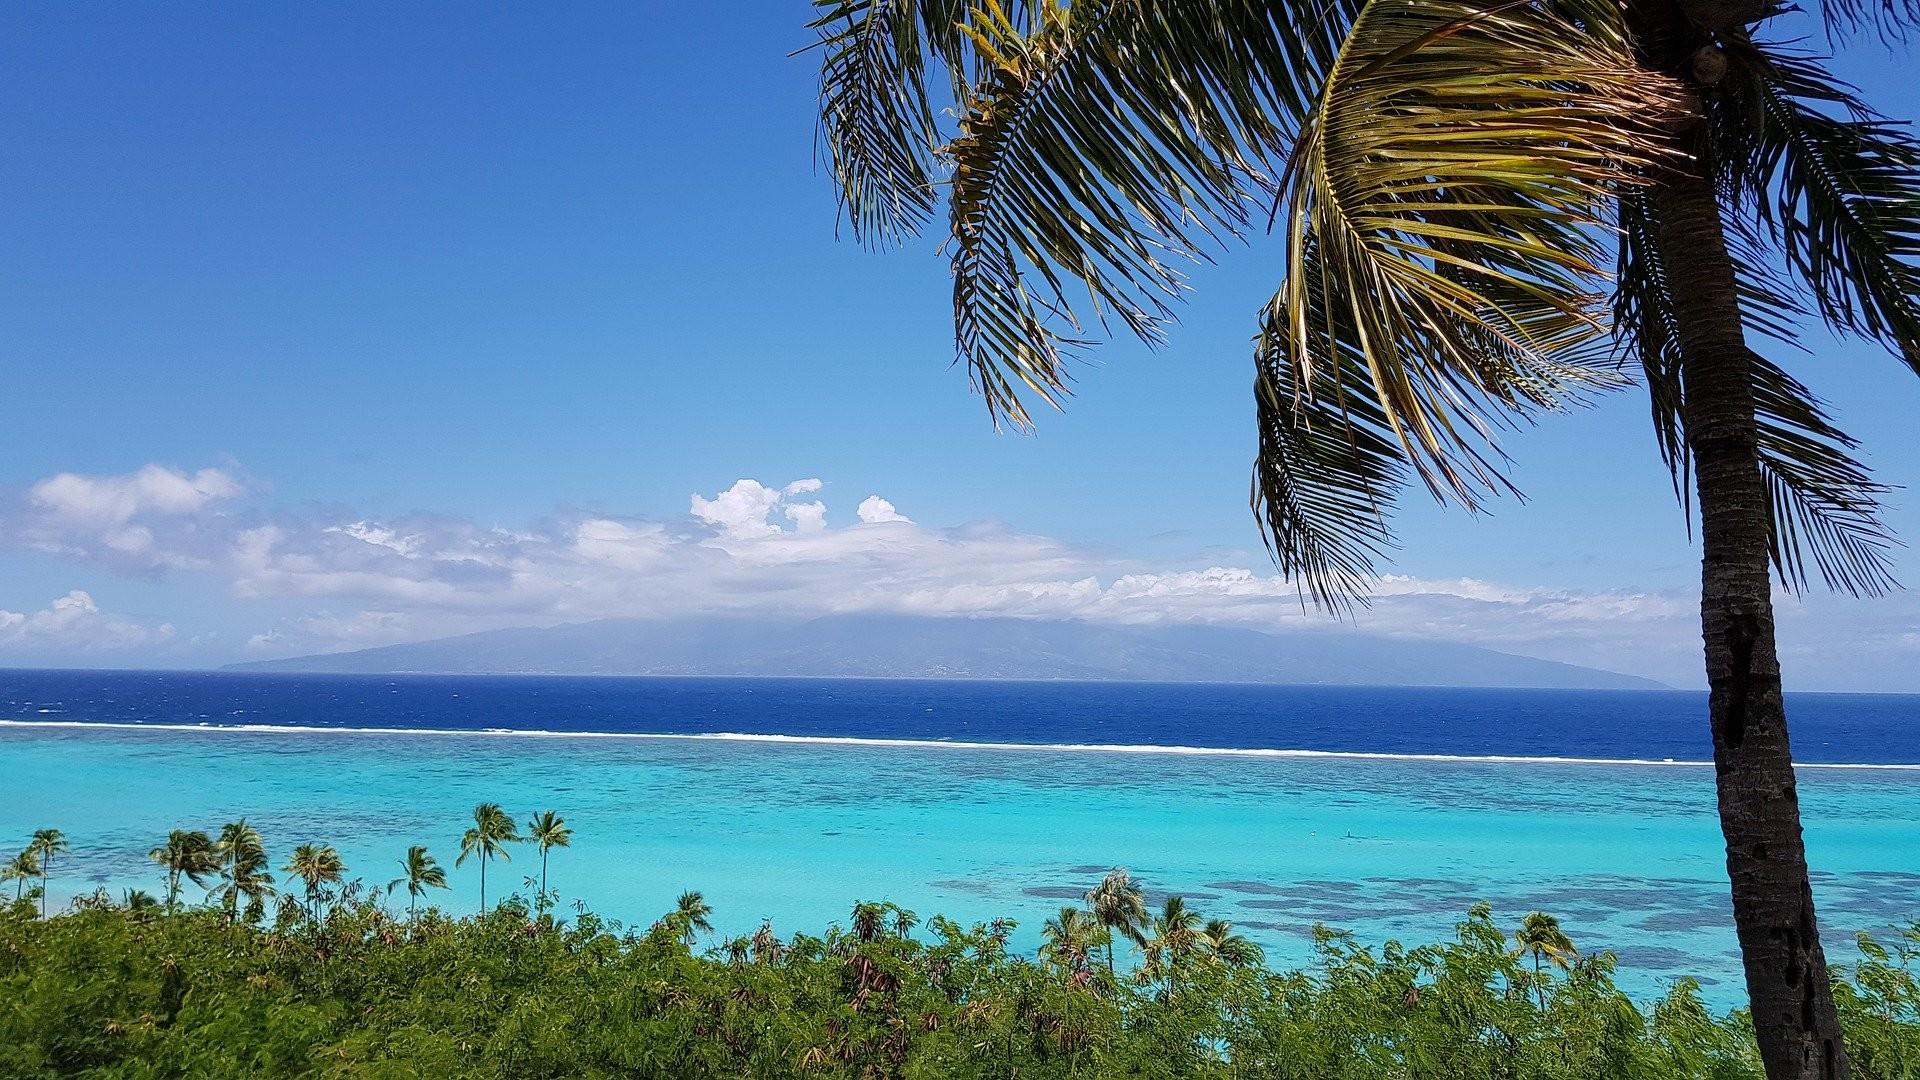 news-main-tahiti-lart-en-ligne-en-vente-et-en-location.1590237376.jpg